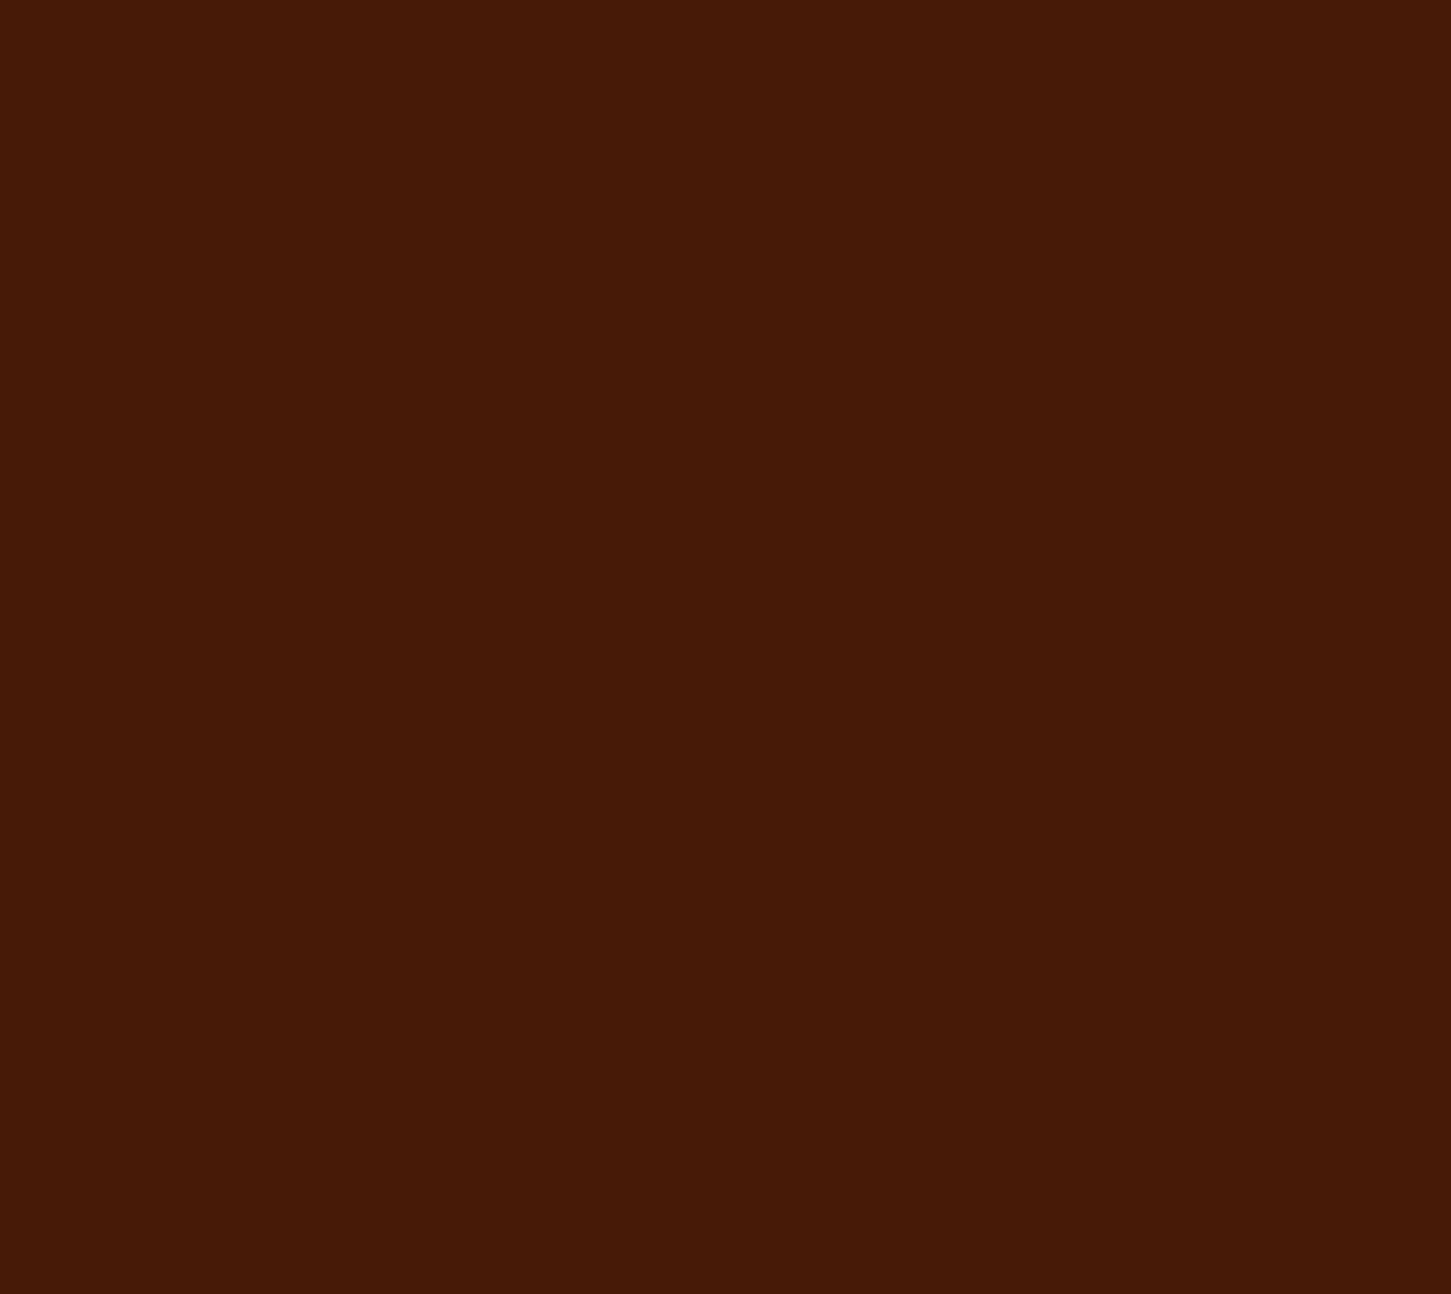 RAL8017 Schokoladenbraun